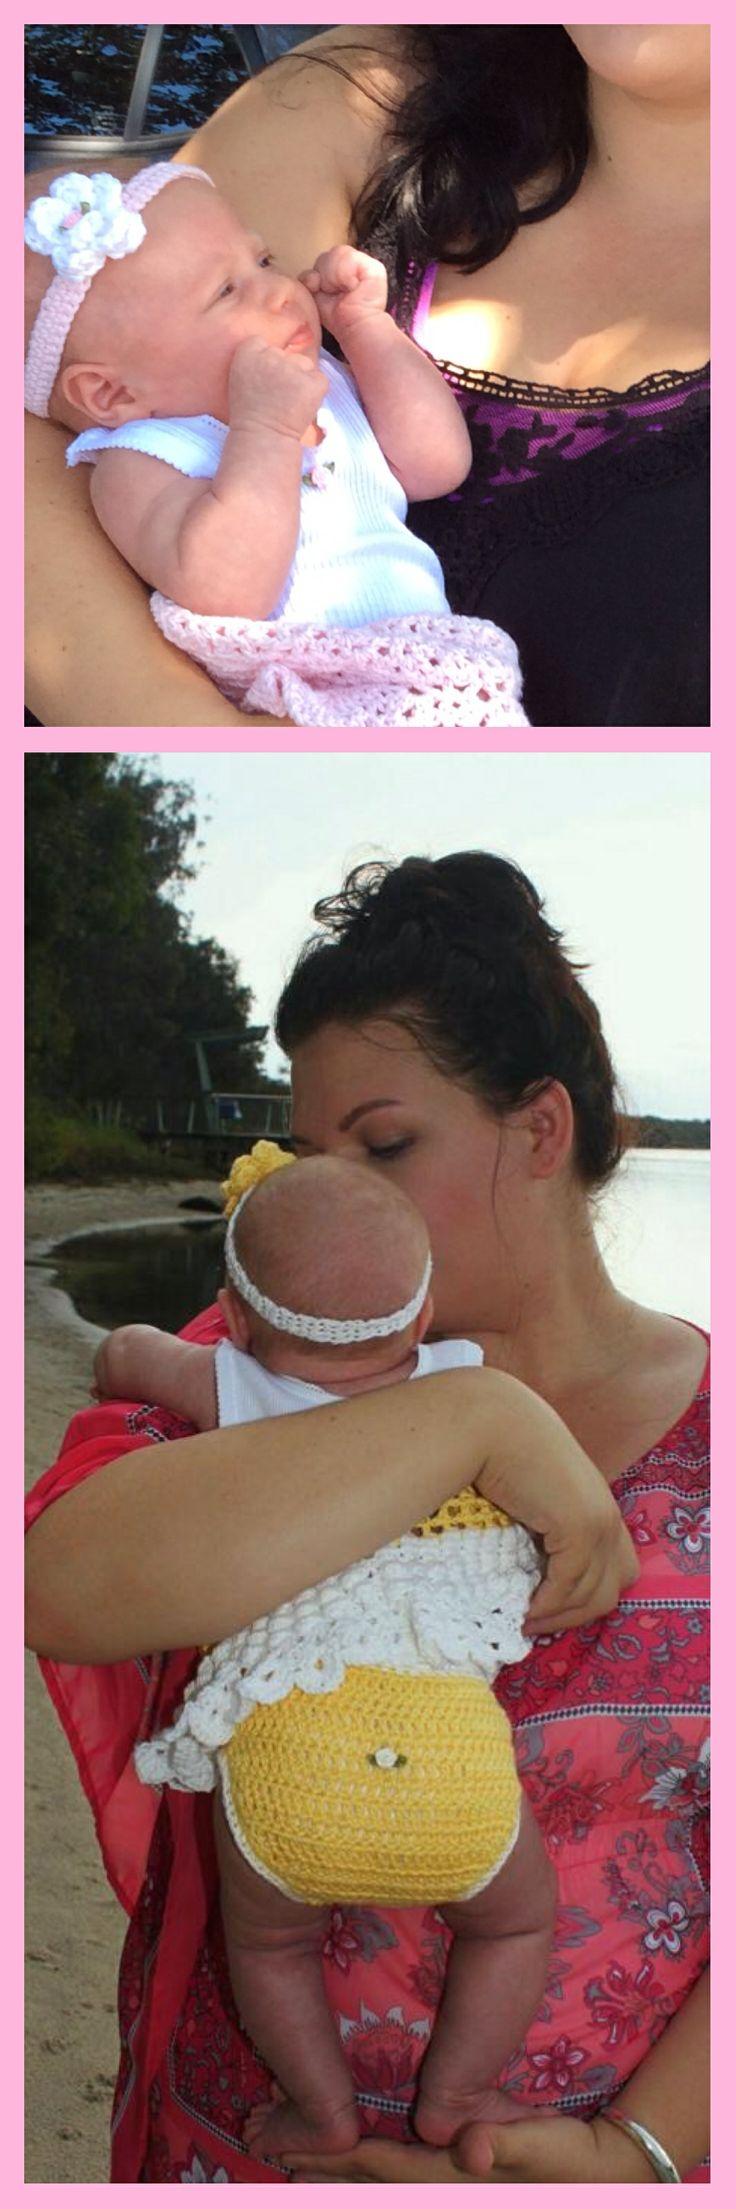 Beautiful Isla in her crochet baby outfit  all made in 100% Bendigo Woollen Mills Cotton Crochet Designz Instagram page